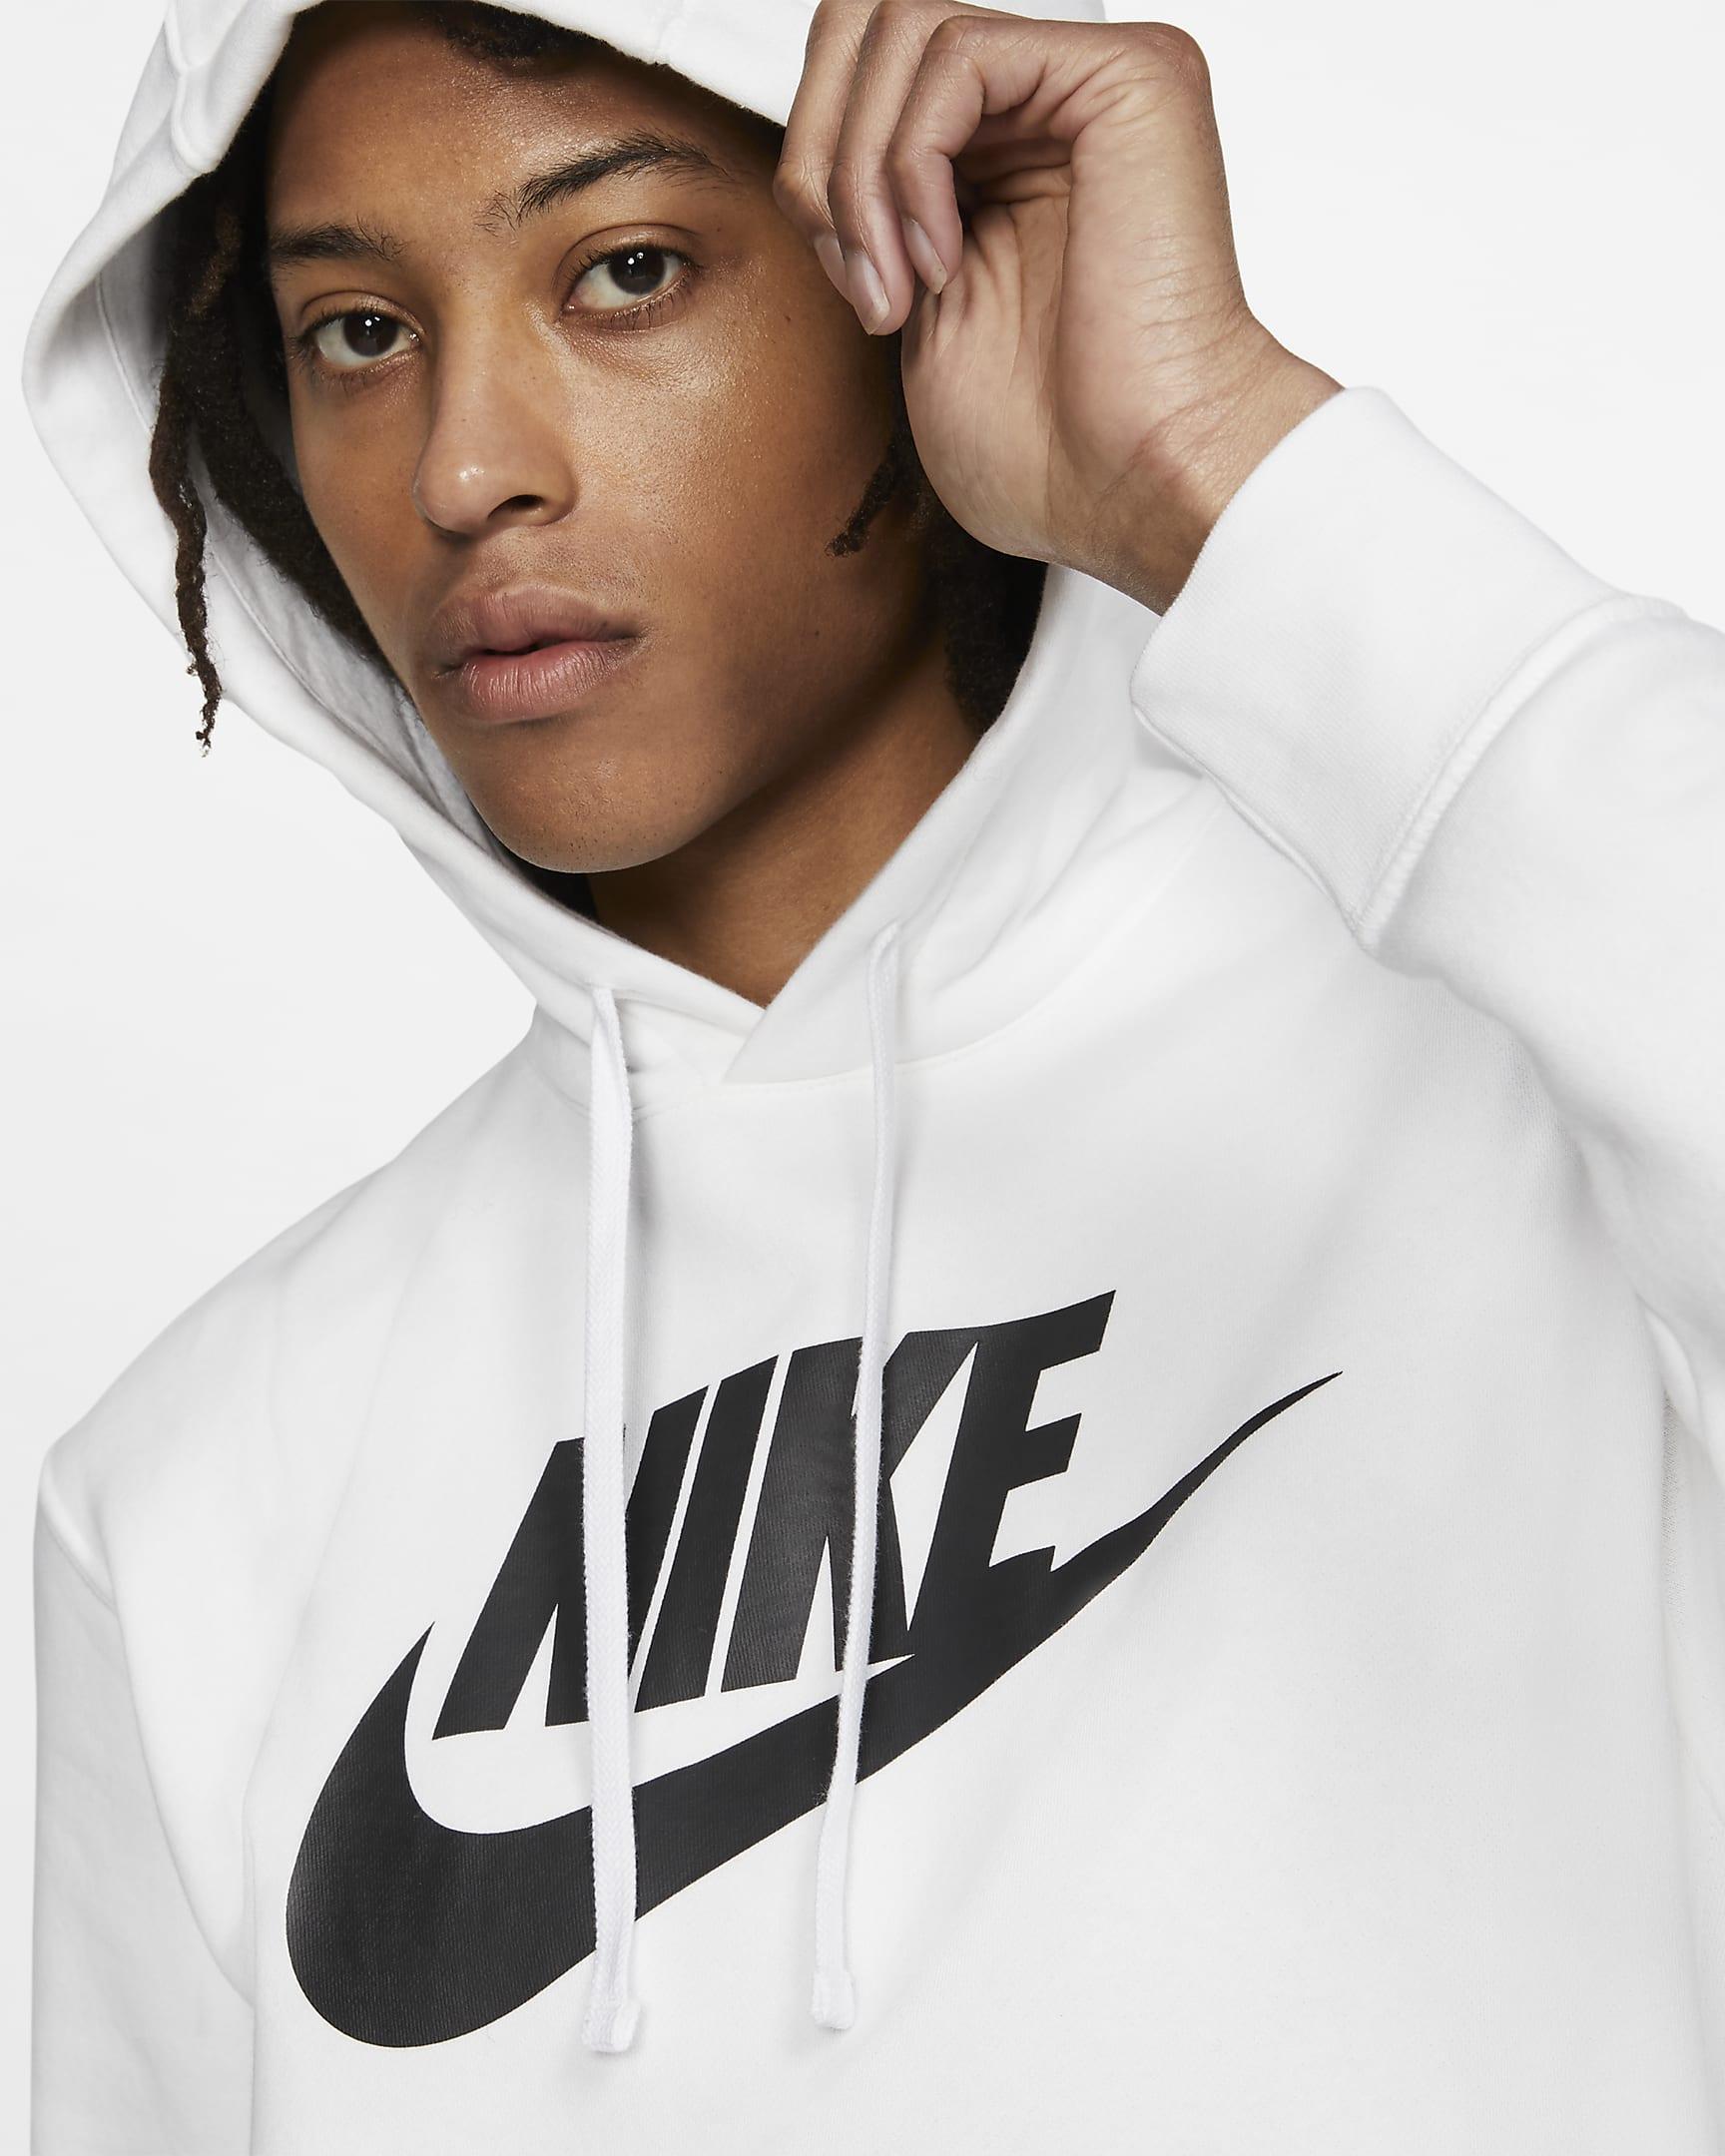 nike-sportswear-club-fleece-mens-graphic-pullover-hoodie-R9w74B-1.png